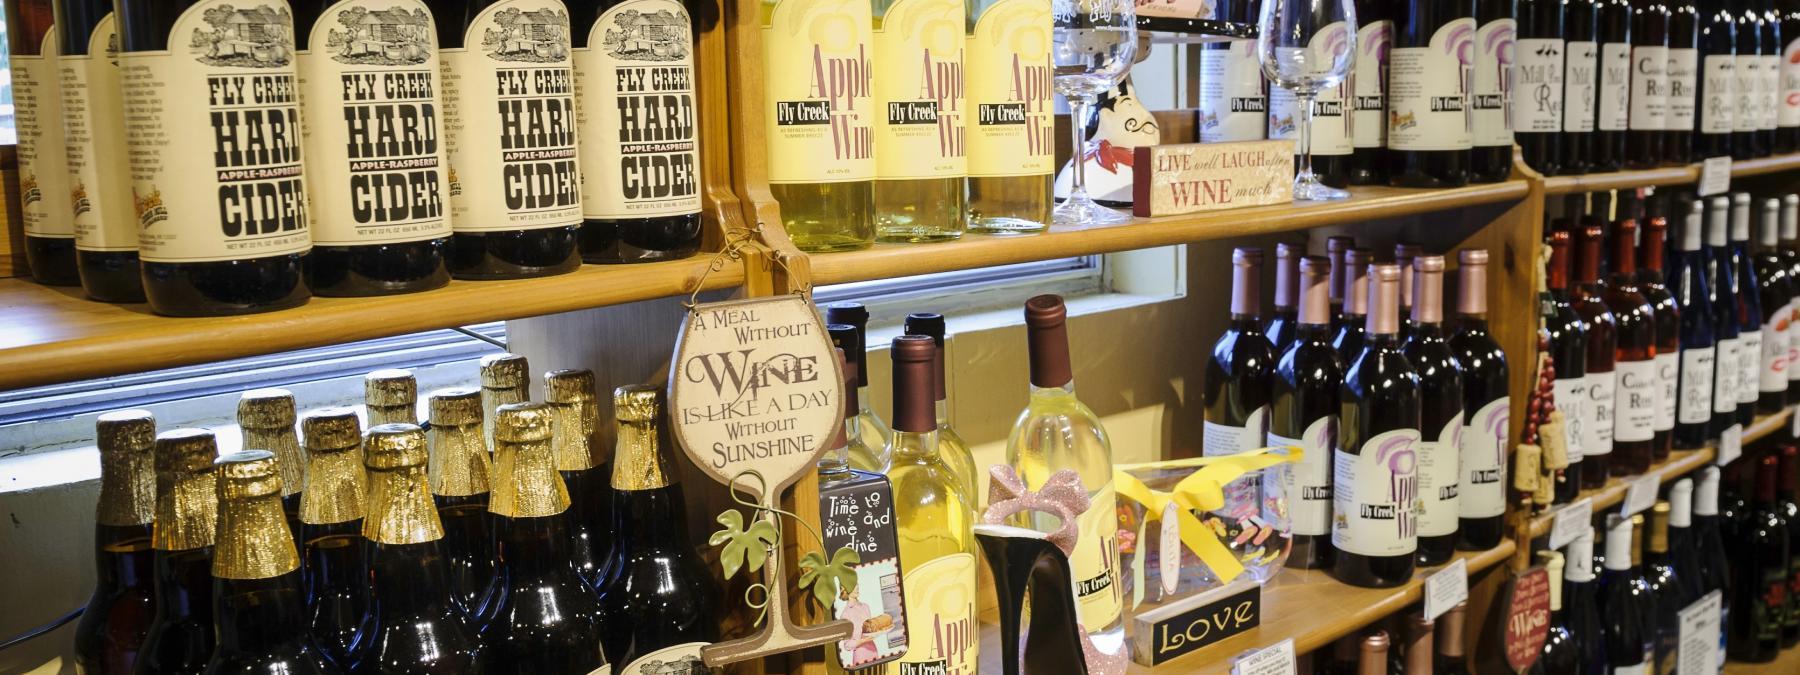 Wine Lovers Paradise